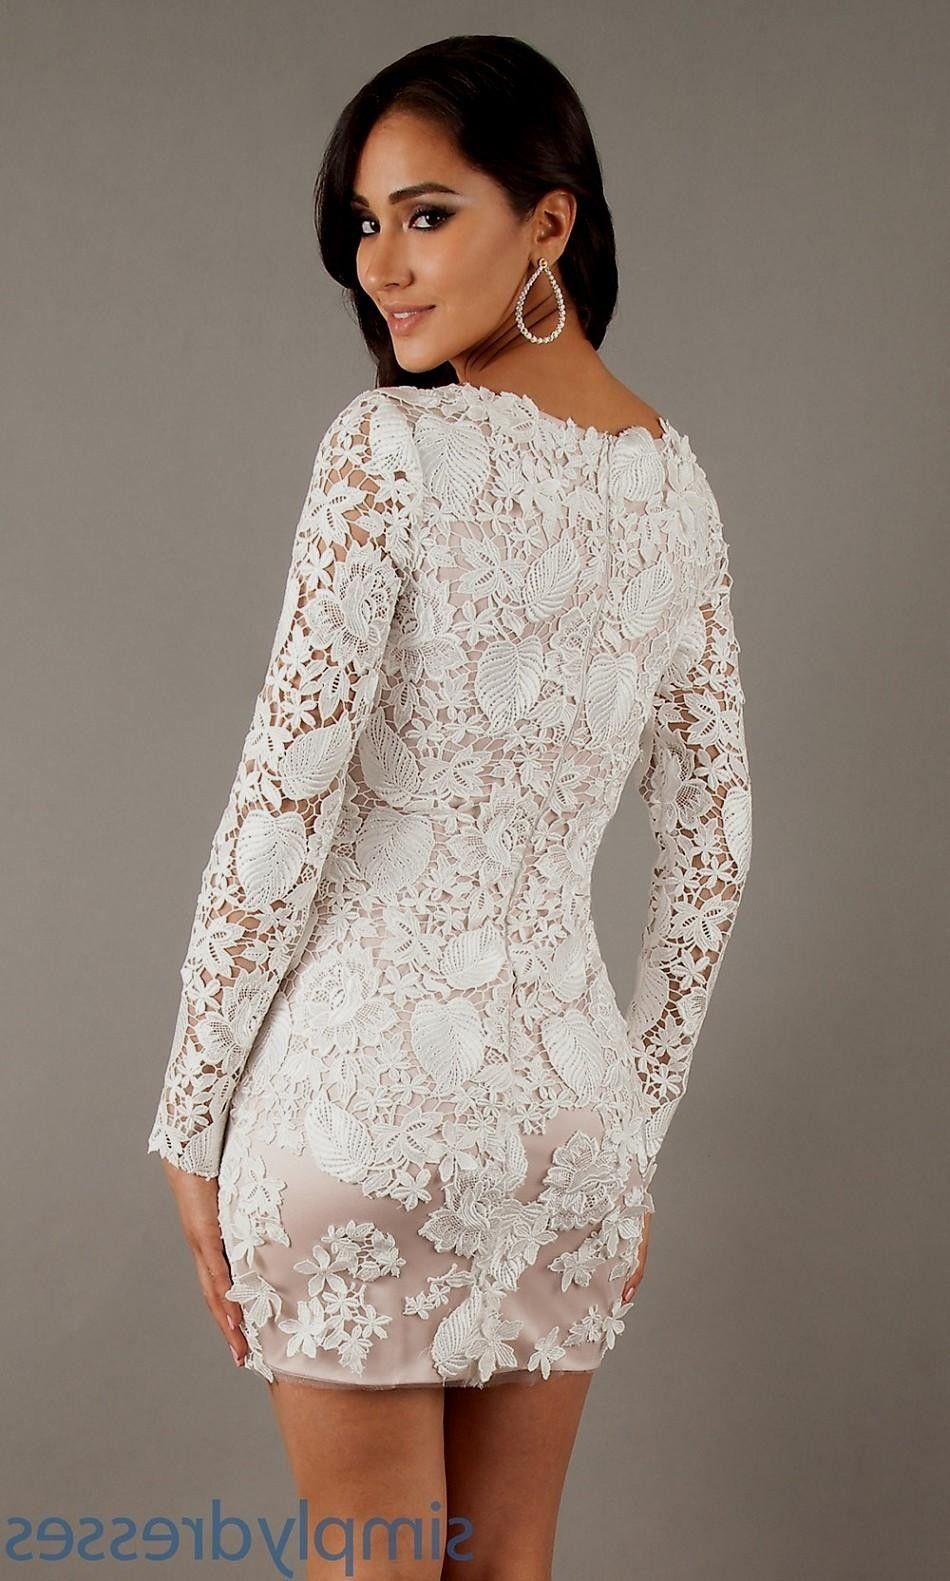 Long White Lace Dresses With Sleeves World Dresses Moda Feminina Moda Feminino [ 1581 x 950 Pixel ]